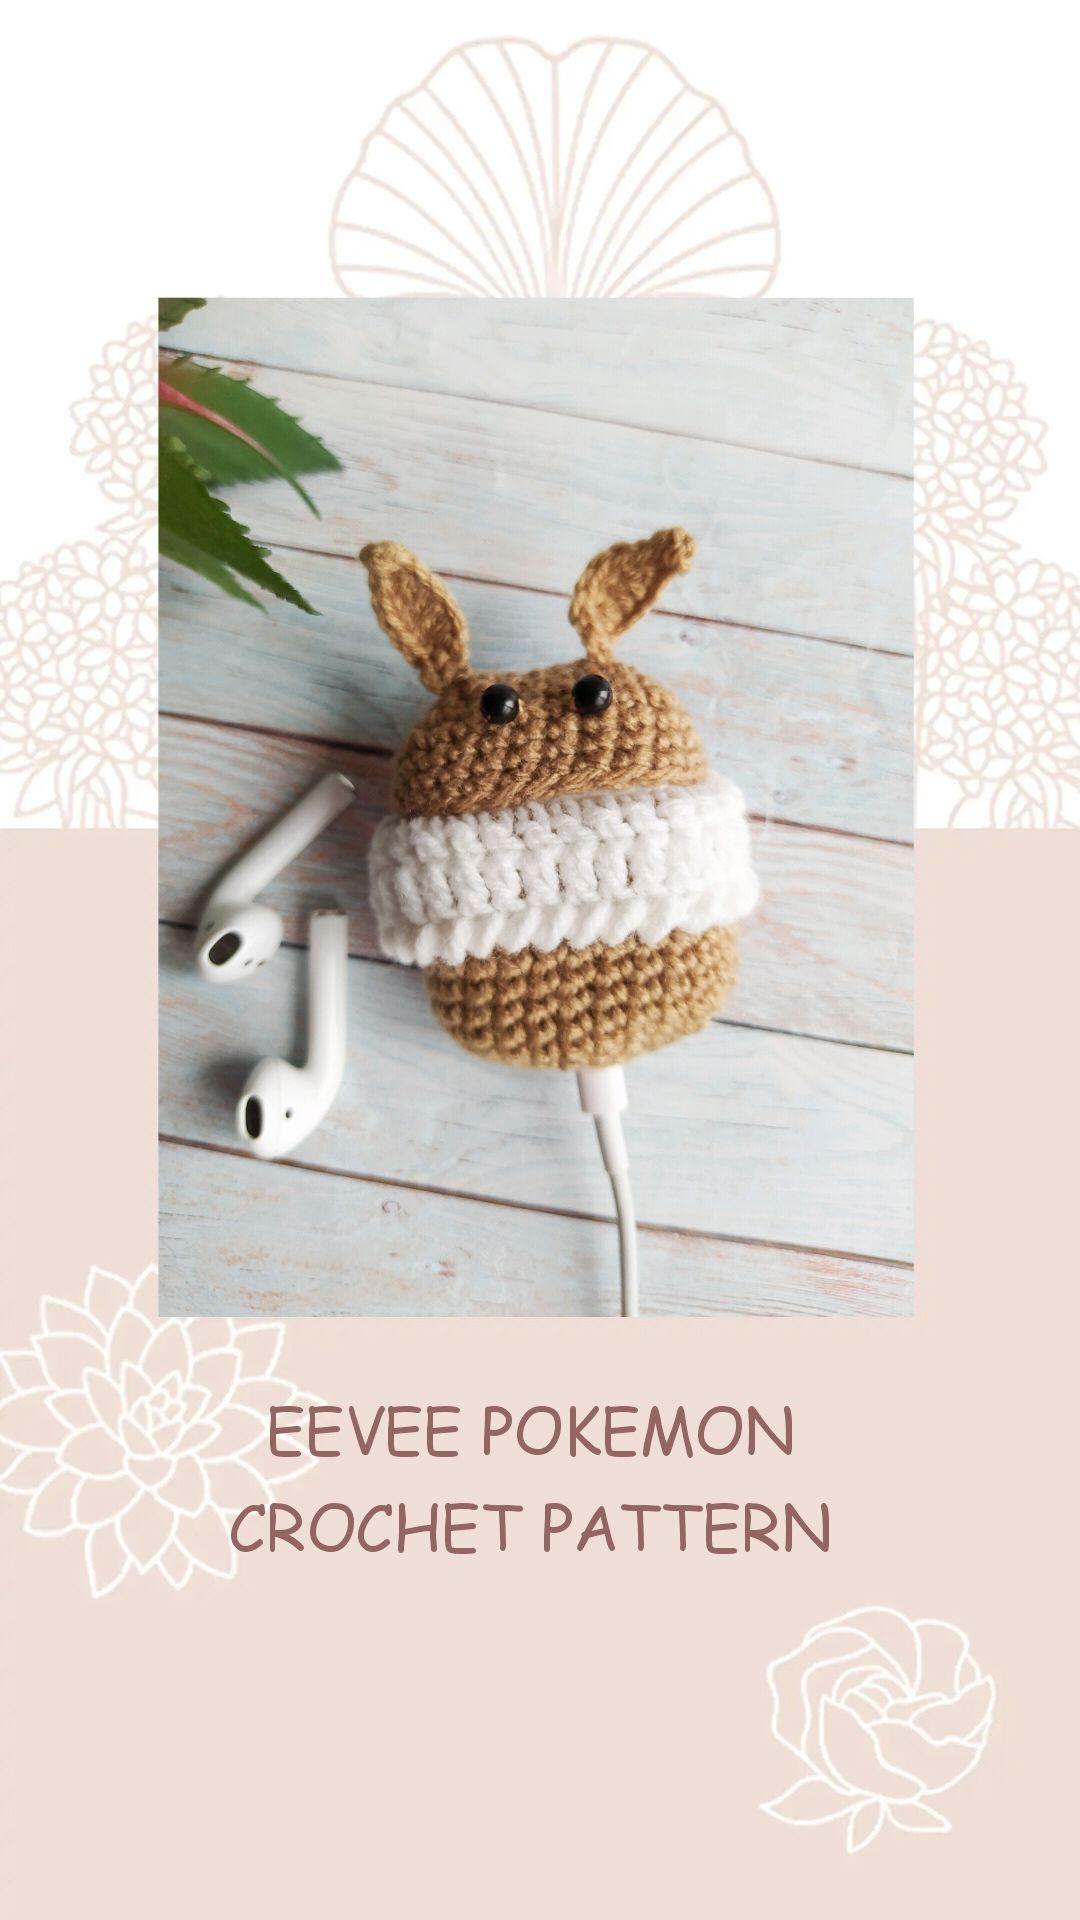 Cute Crochet Pokemon Eevee Amigurumi Crochet Pattern For Etsy In 2020 Crochet Pokemon Pokemon Crochet Pattern Crochet Patterns